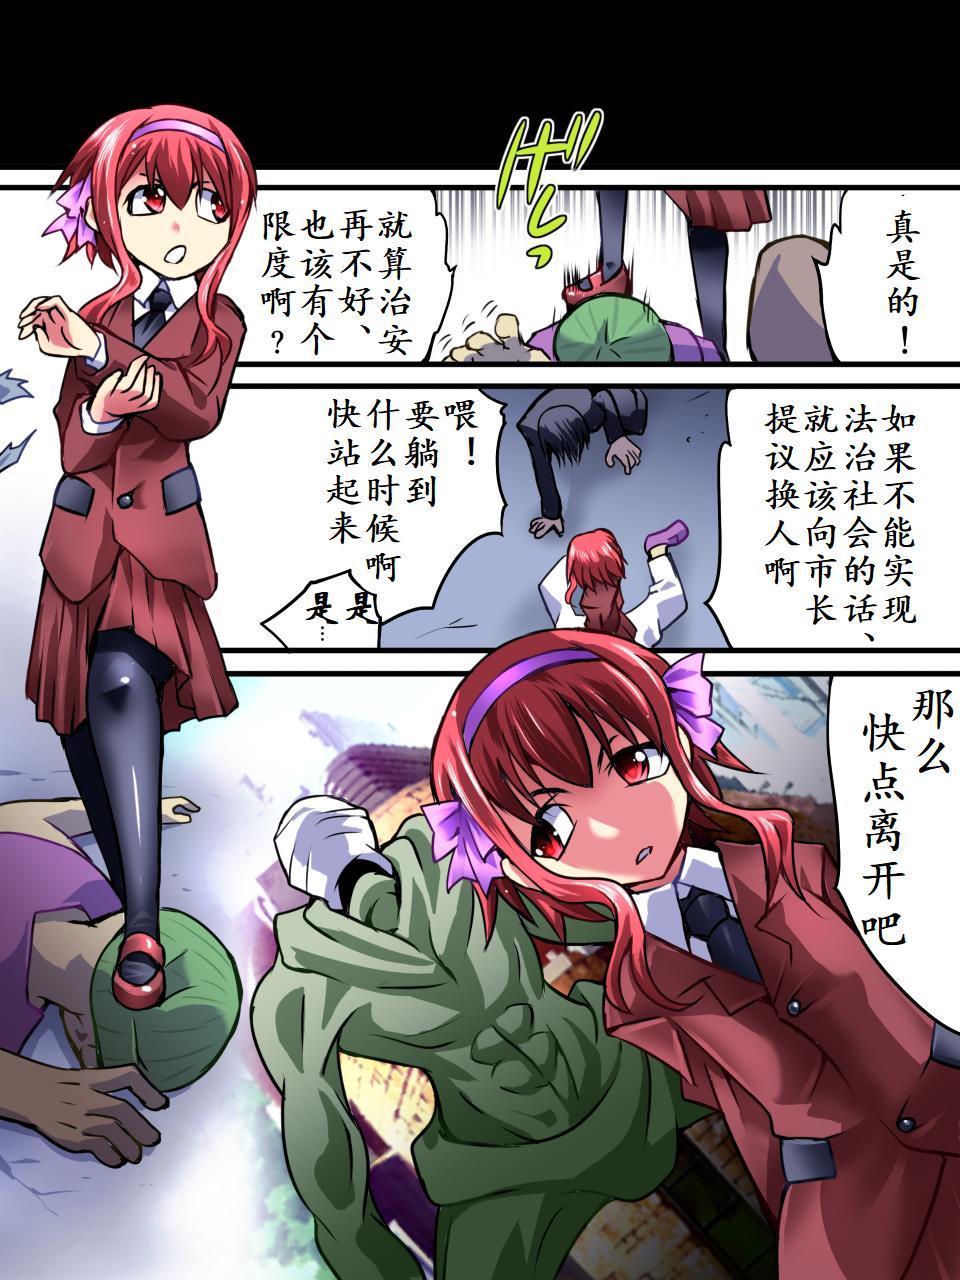 [Atelier Hachifukuan] Superheroine Yuukai Ryoujoku III - Superheroine in Distress [Chrome Rose Bell]   凌辱诱拐3 [Chinese] [有条色狼汉化] 3